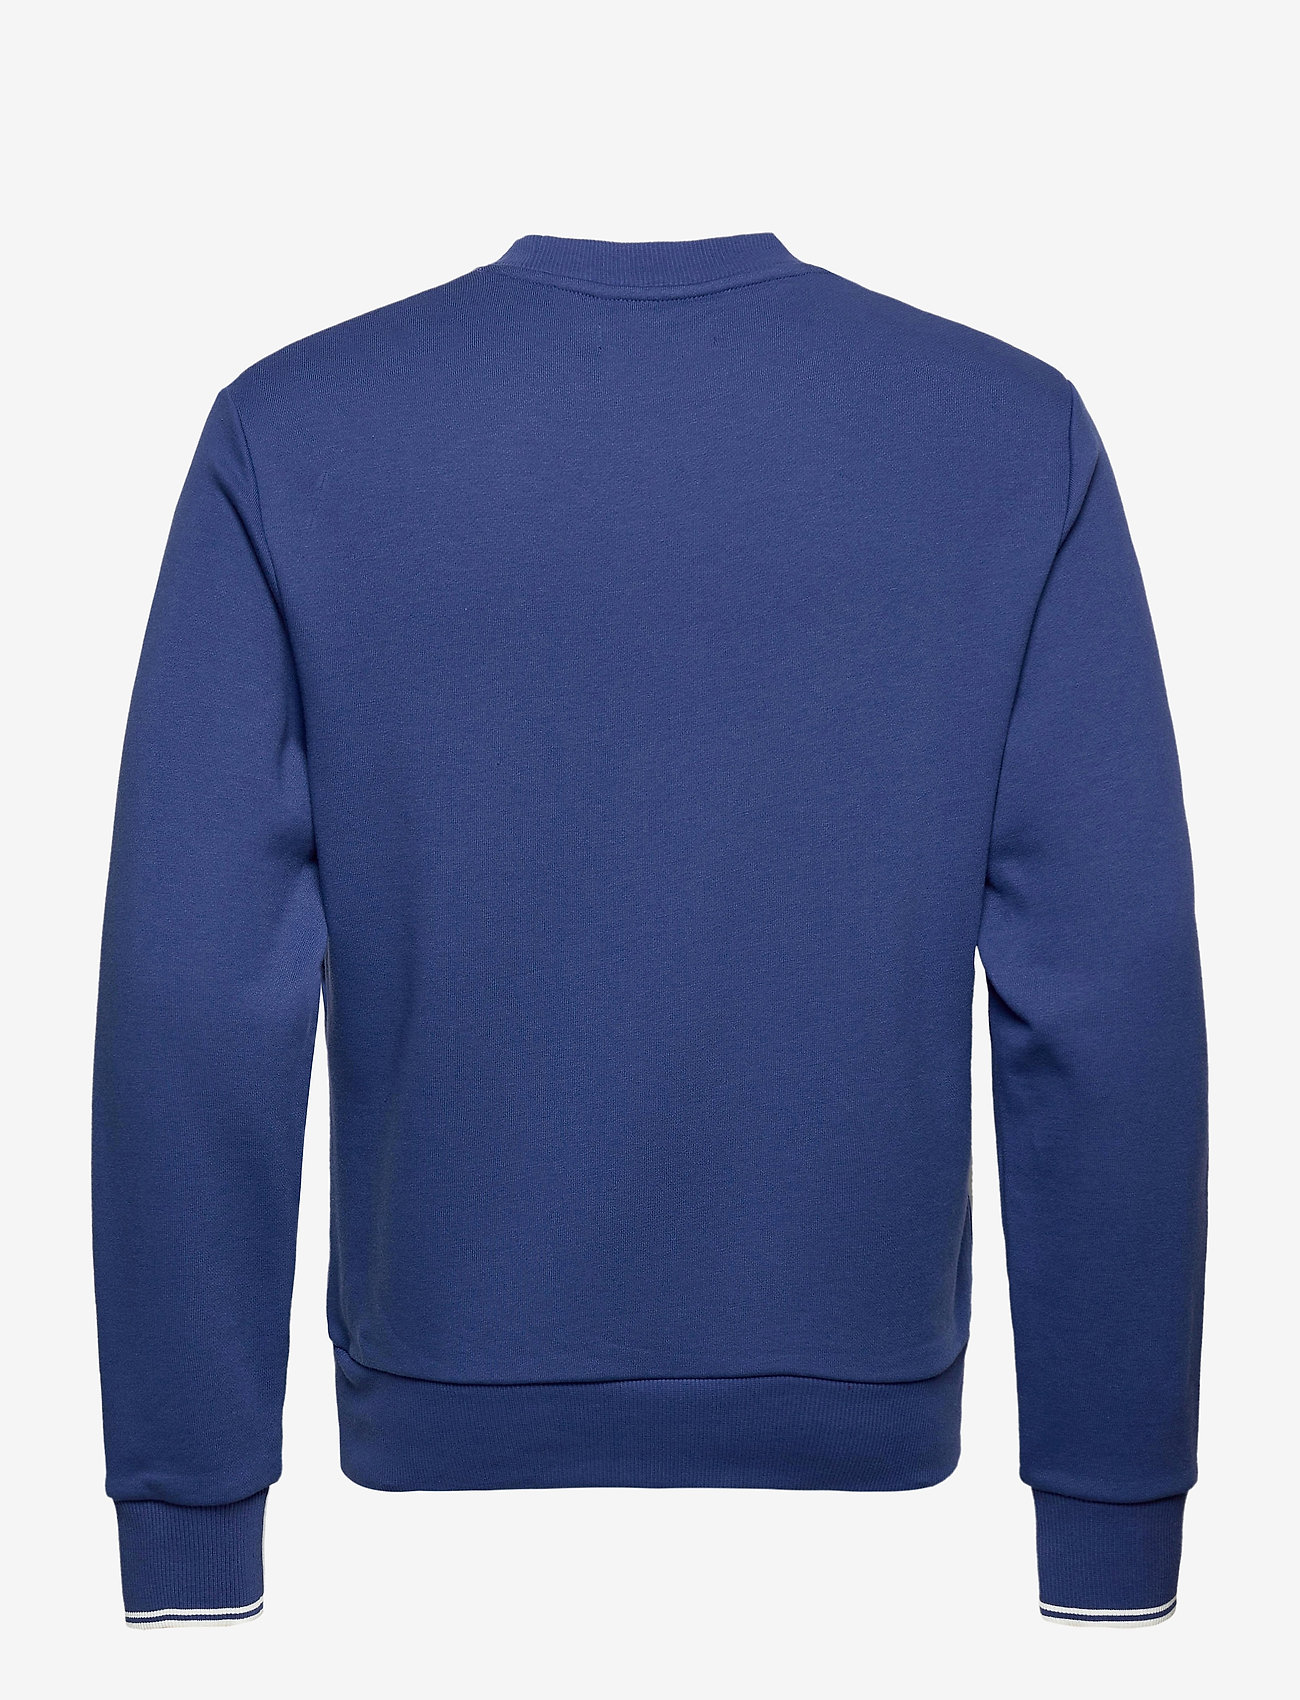 Fred Perry CREW NECK SWEATSHIRT - Sweatshirts NAUTICAL BLUE - Menn Klær